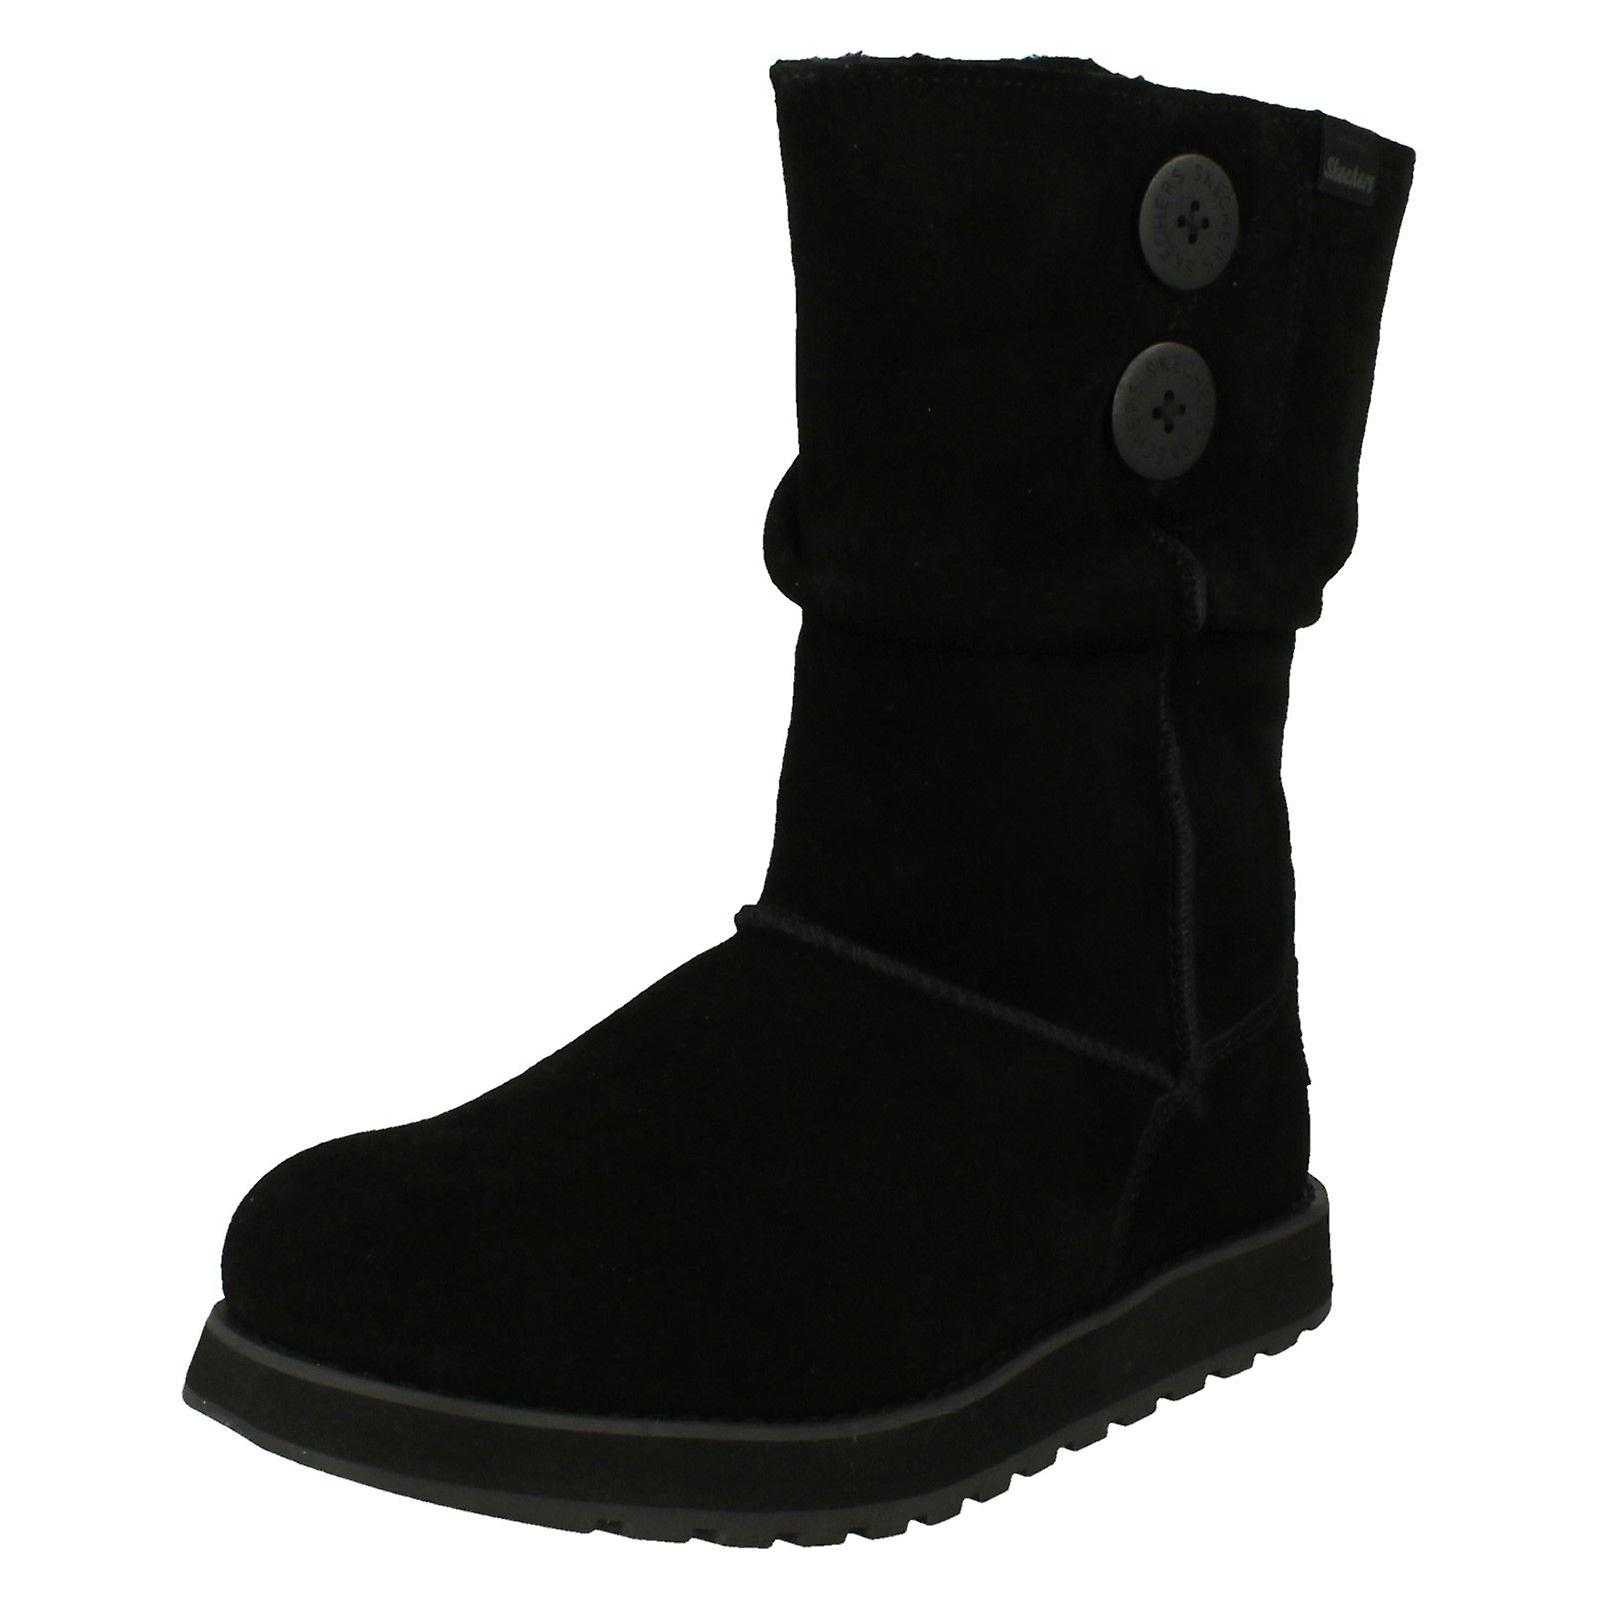 black sketcher boots